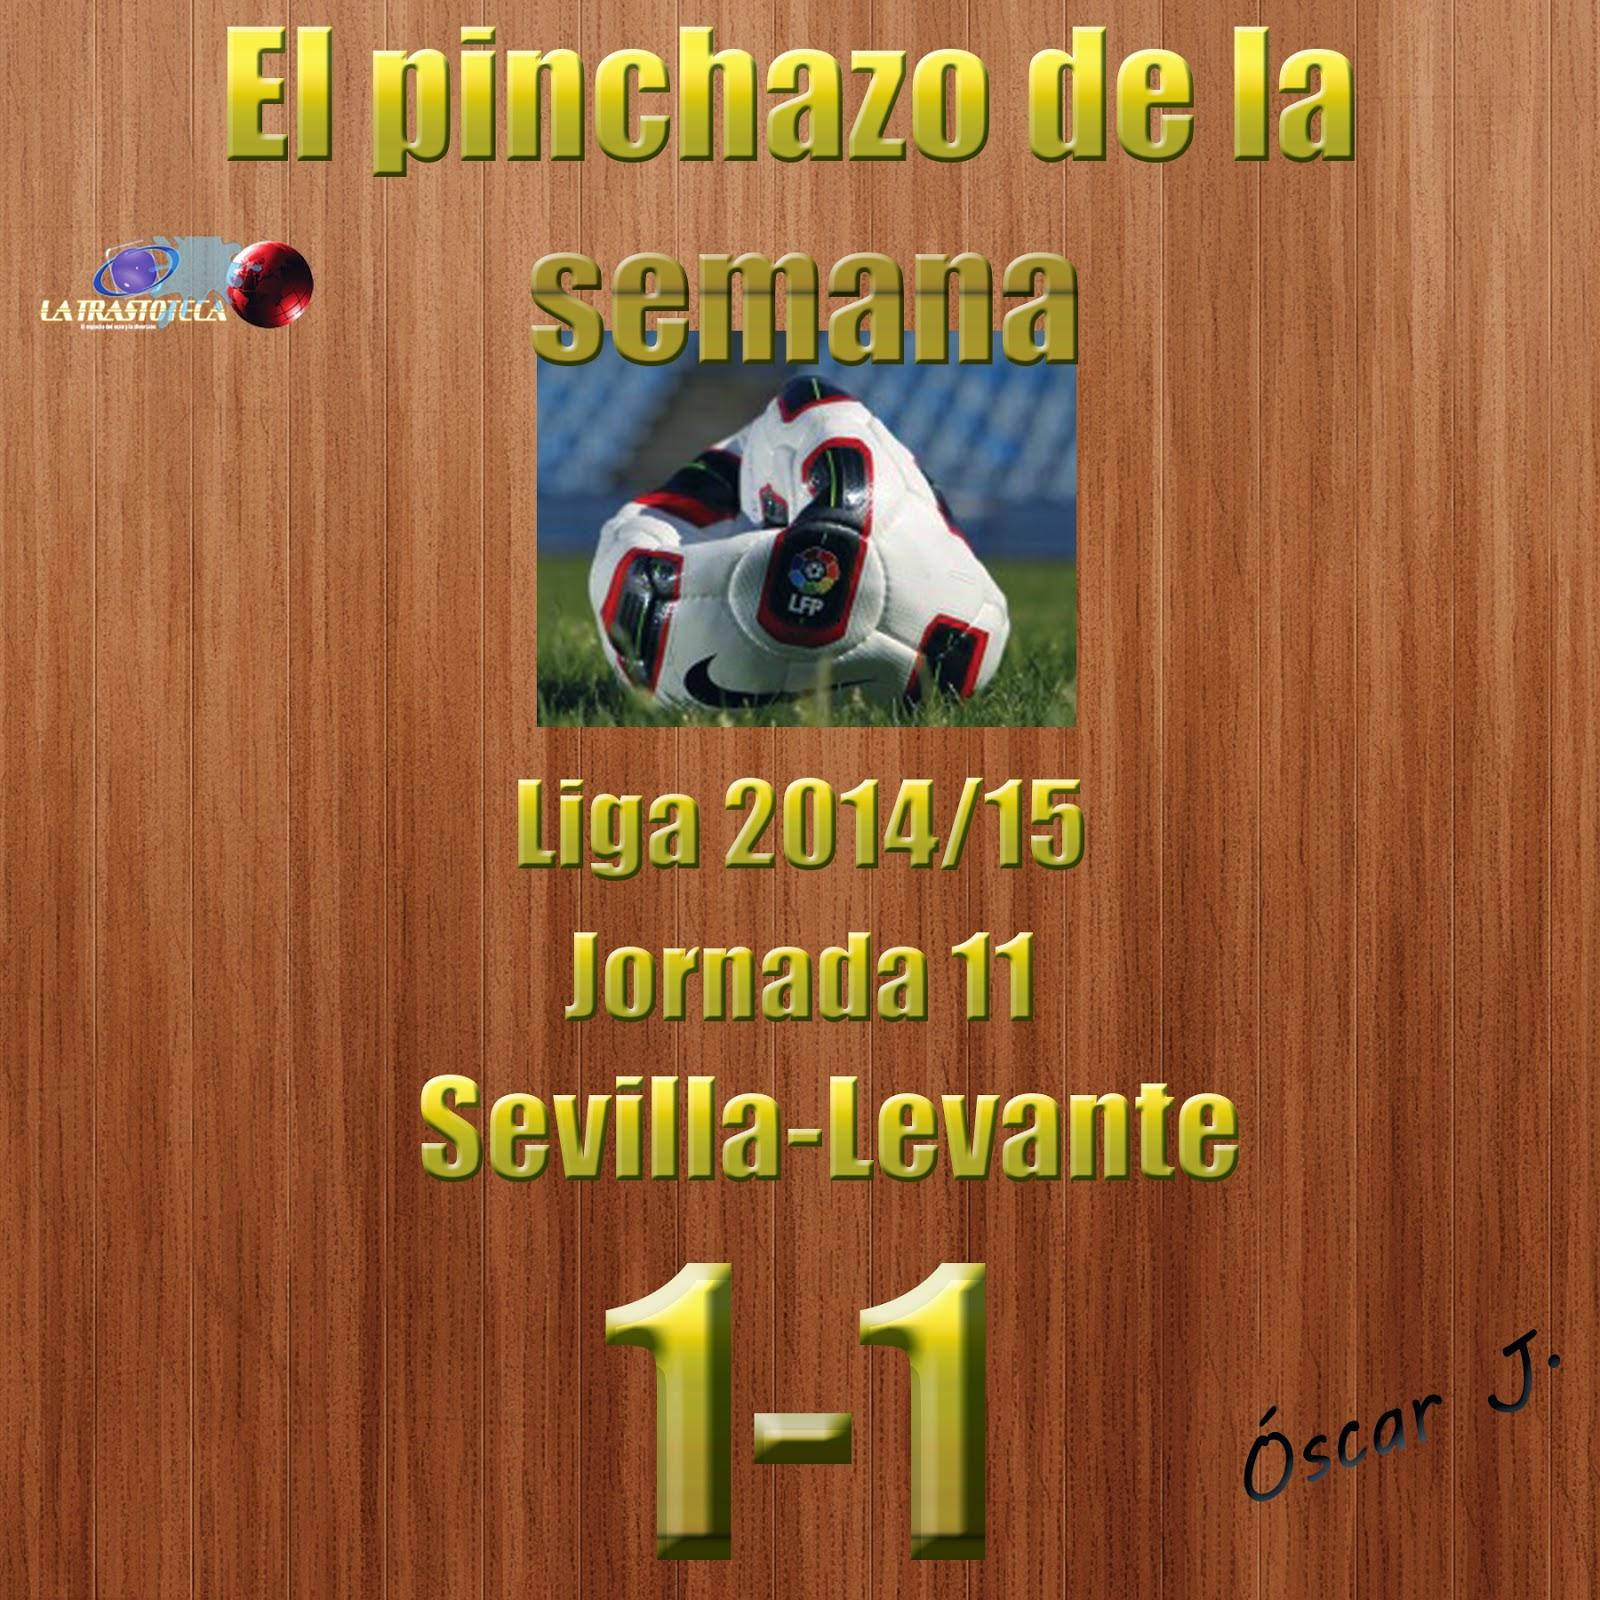 Sevilla 1-1 Levante. Liga 2014/15 - Jornada 11. El pinchazo de la semana.